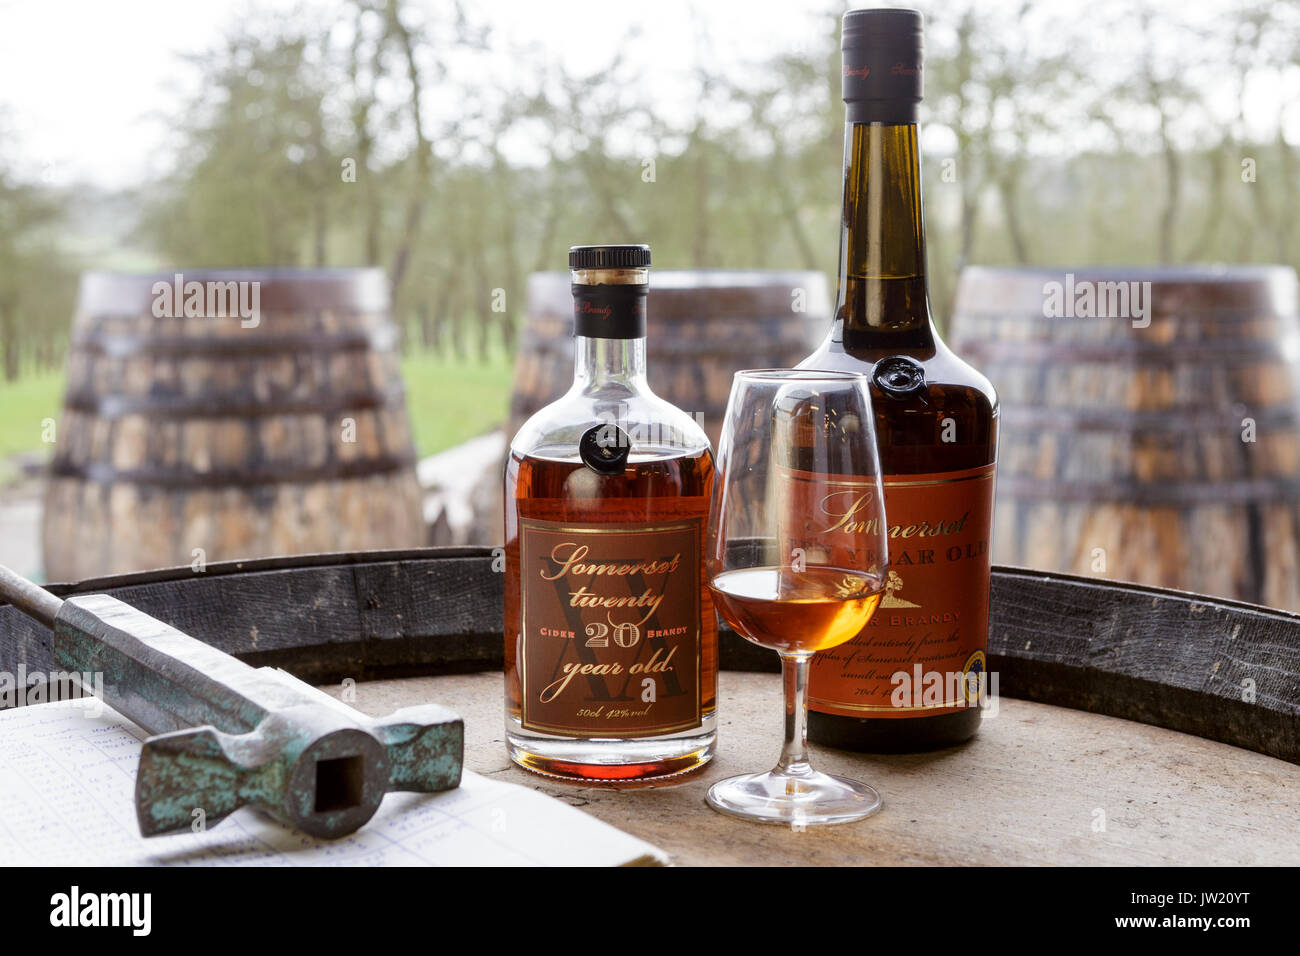 Somerset Cider Brandy, Somerset, UK.  20 year old Somerset Brandy bottle and glass - Stock Image